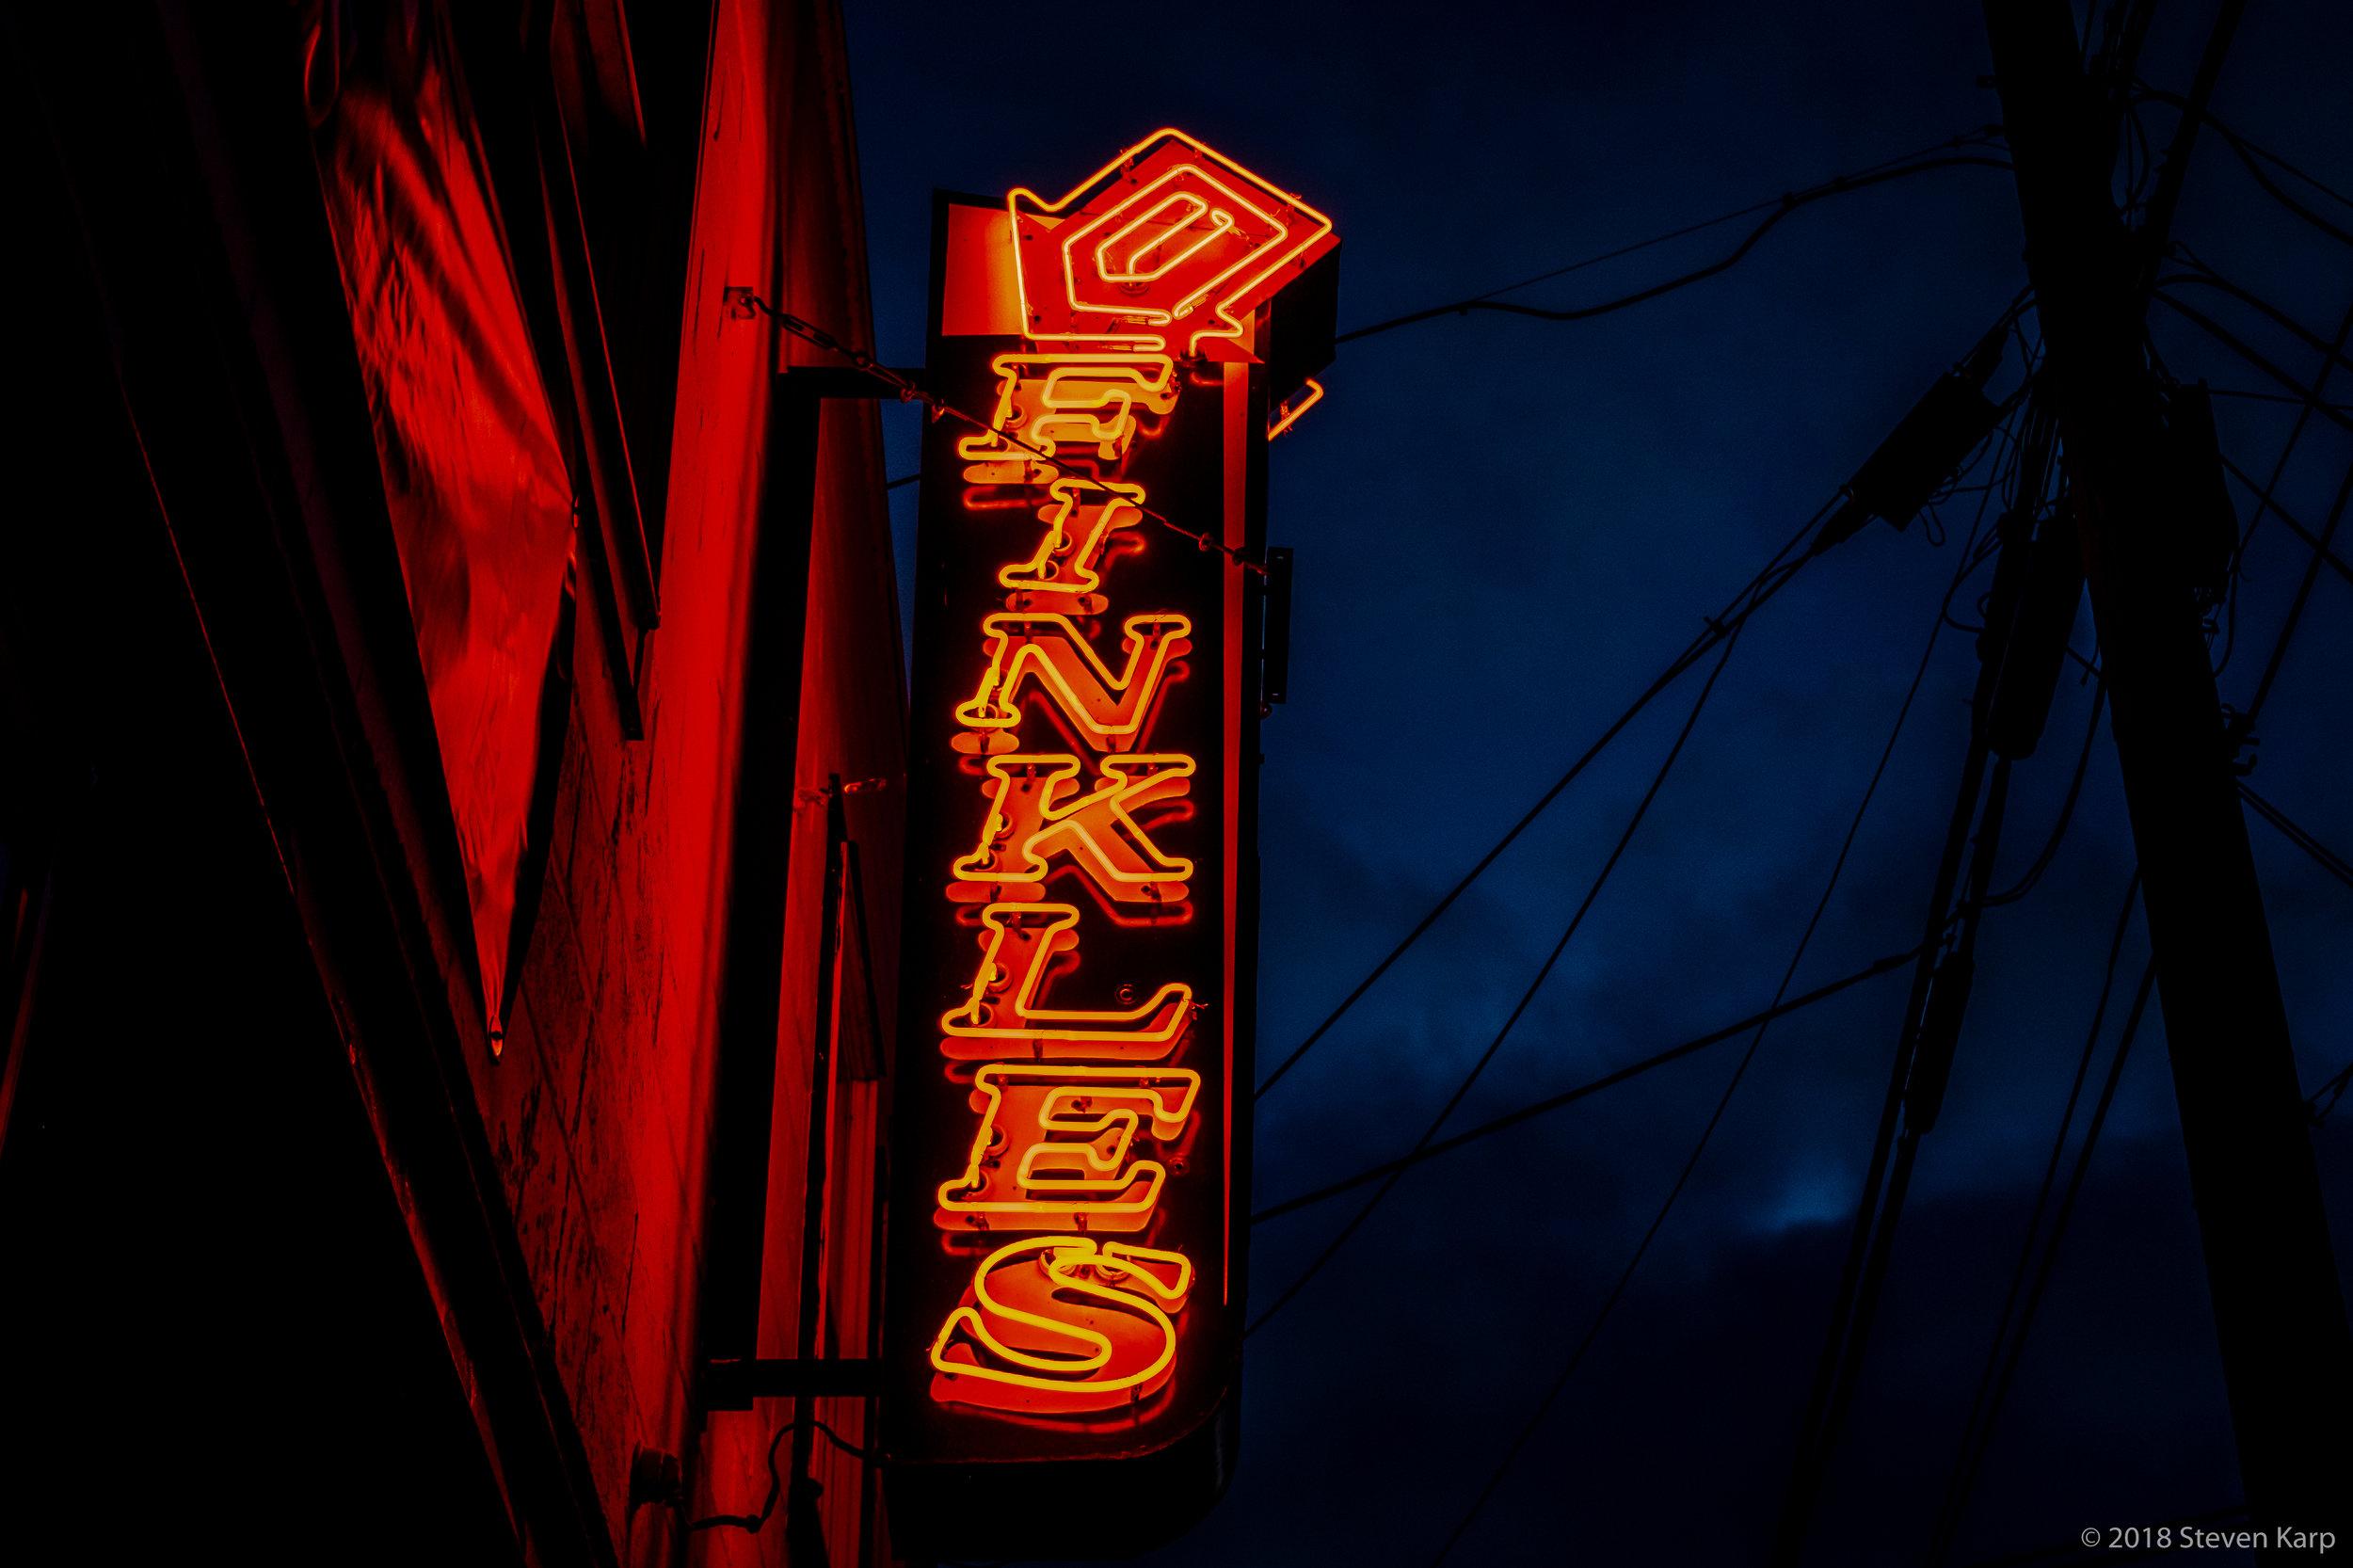 Neon Sign ©2018 S. Karp